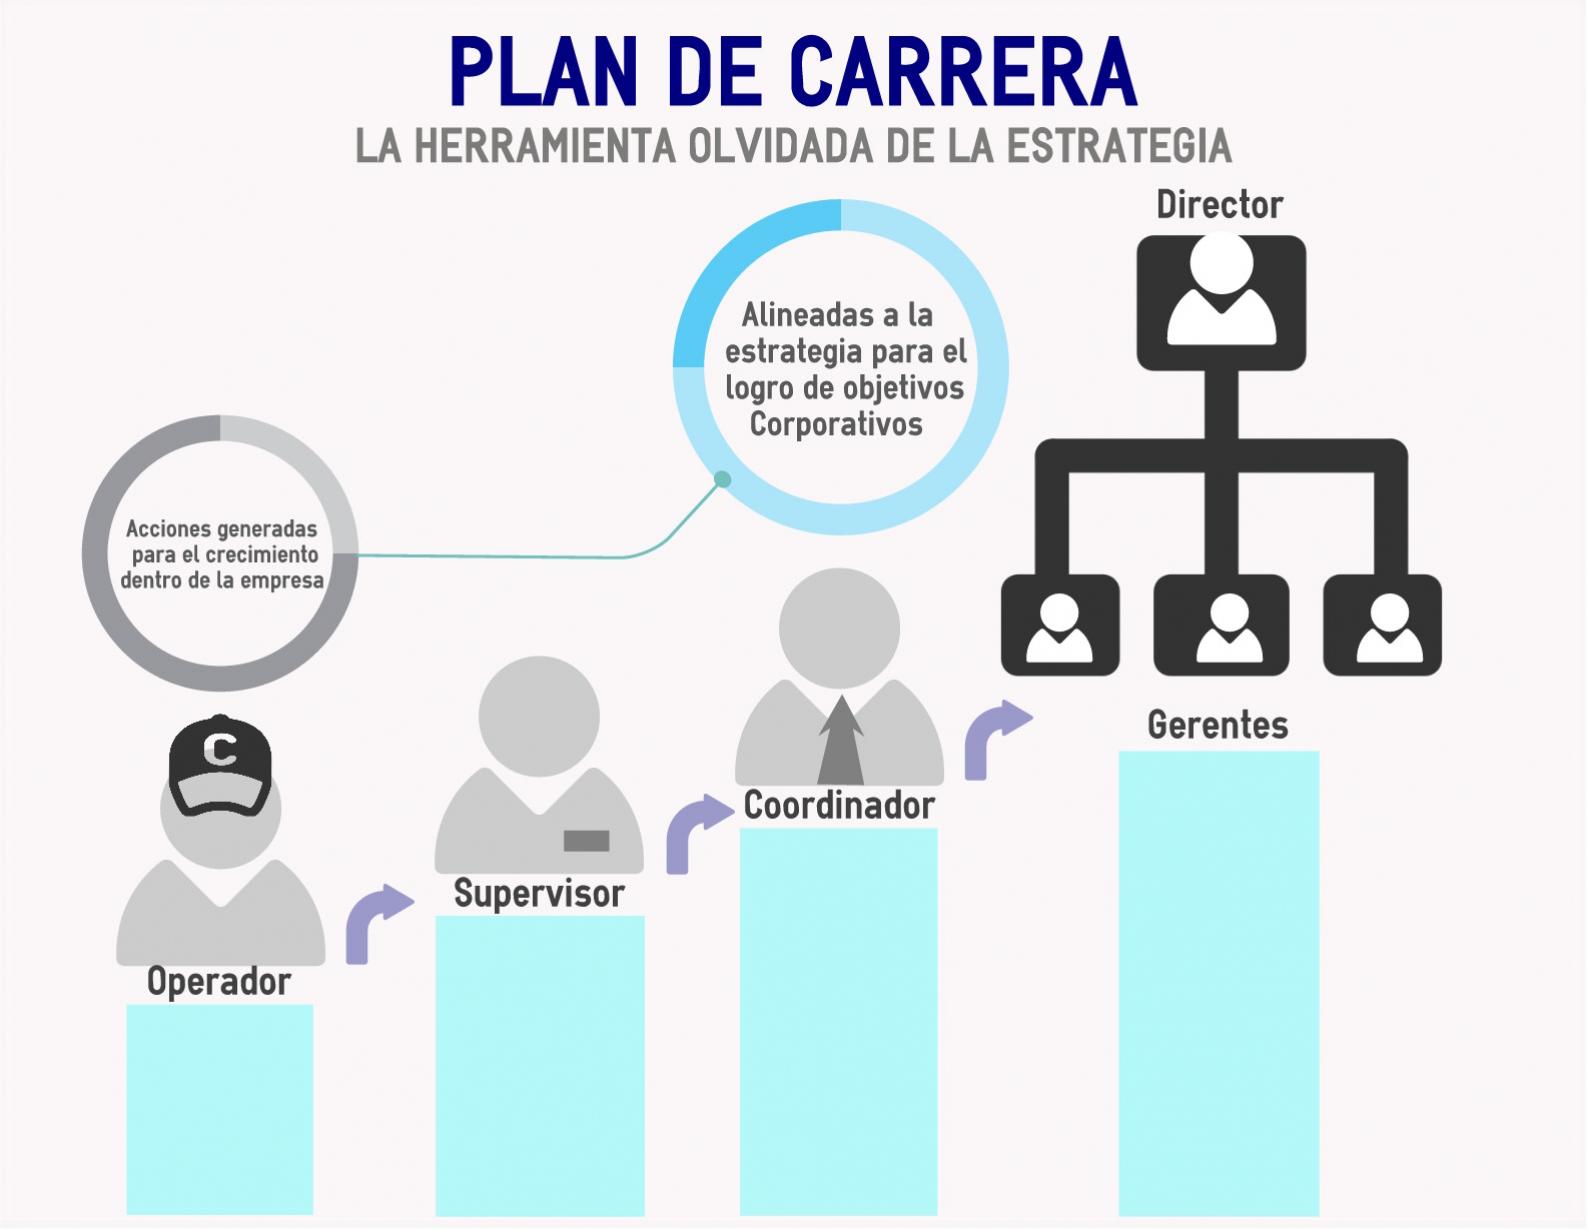 Plan de Carrera, La herramienta olvidada de la Estrategia ...